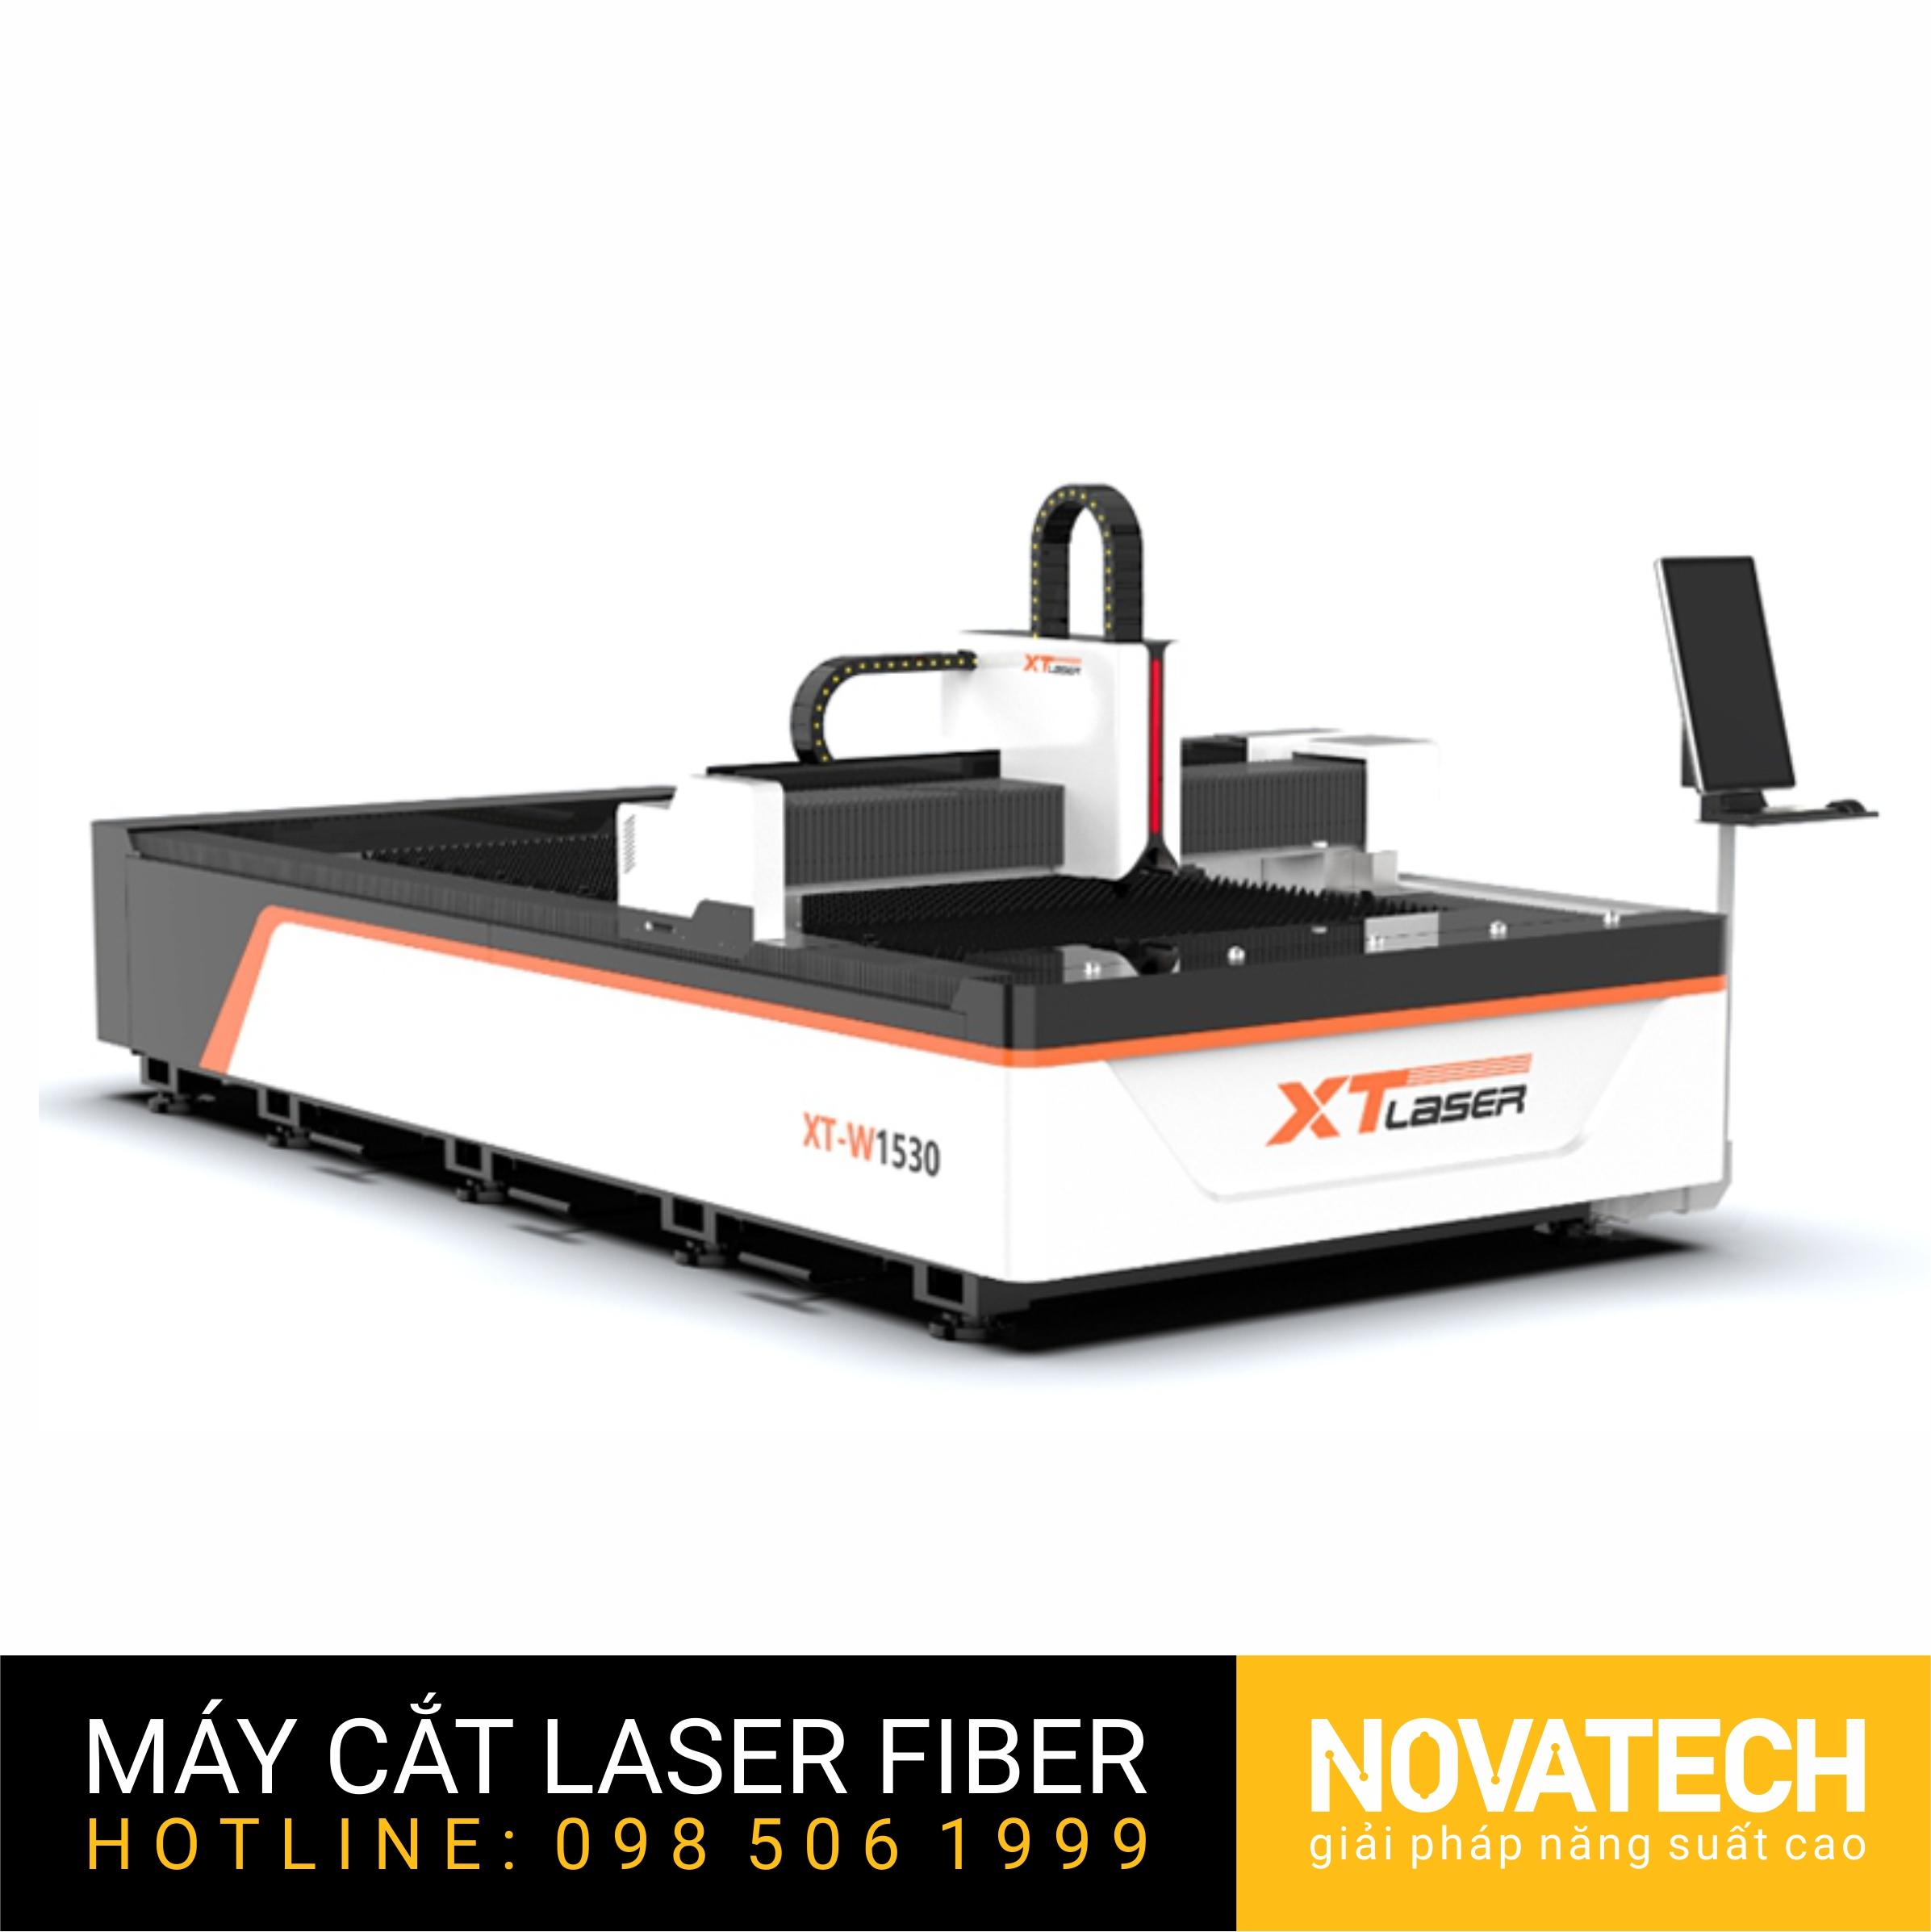 Máy cắt laser fiber bàn đơn XT-Laser W Series